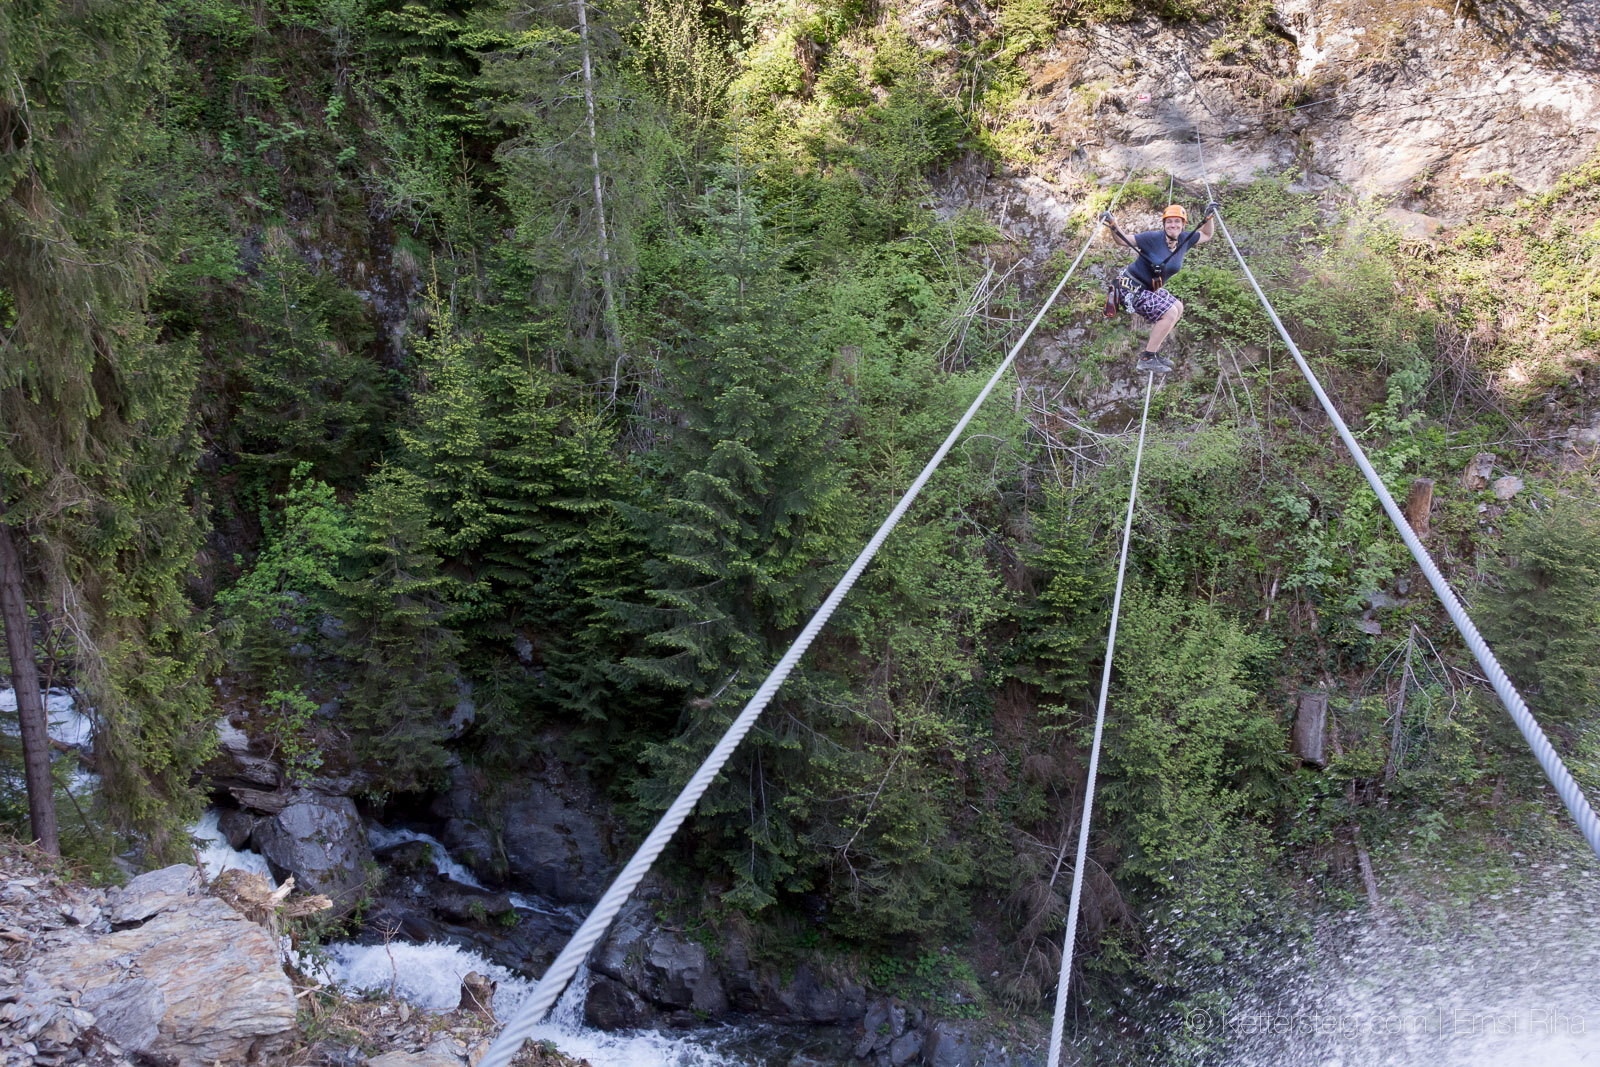 Klettersteig Talbach : Mai talbach klettersteig zillertal